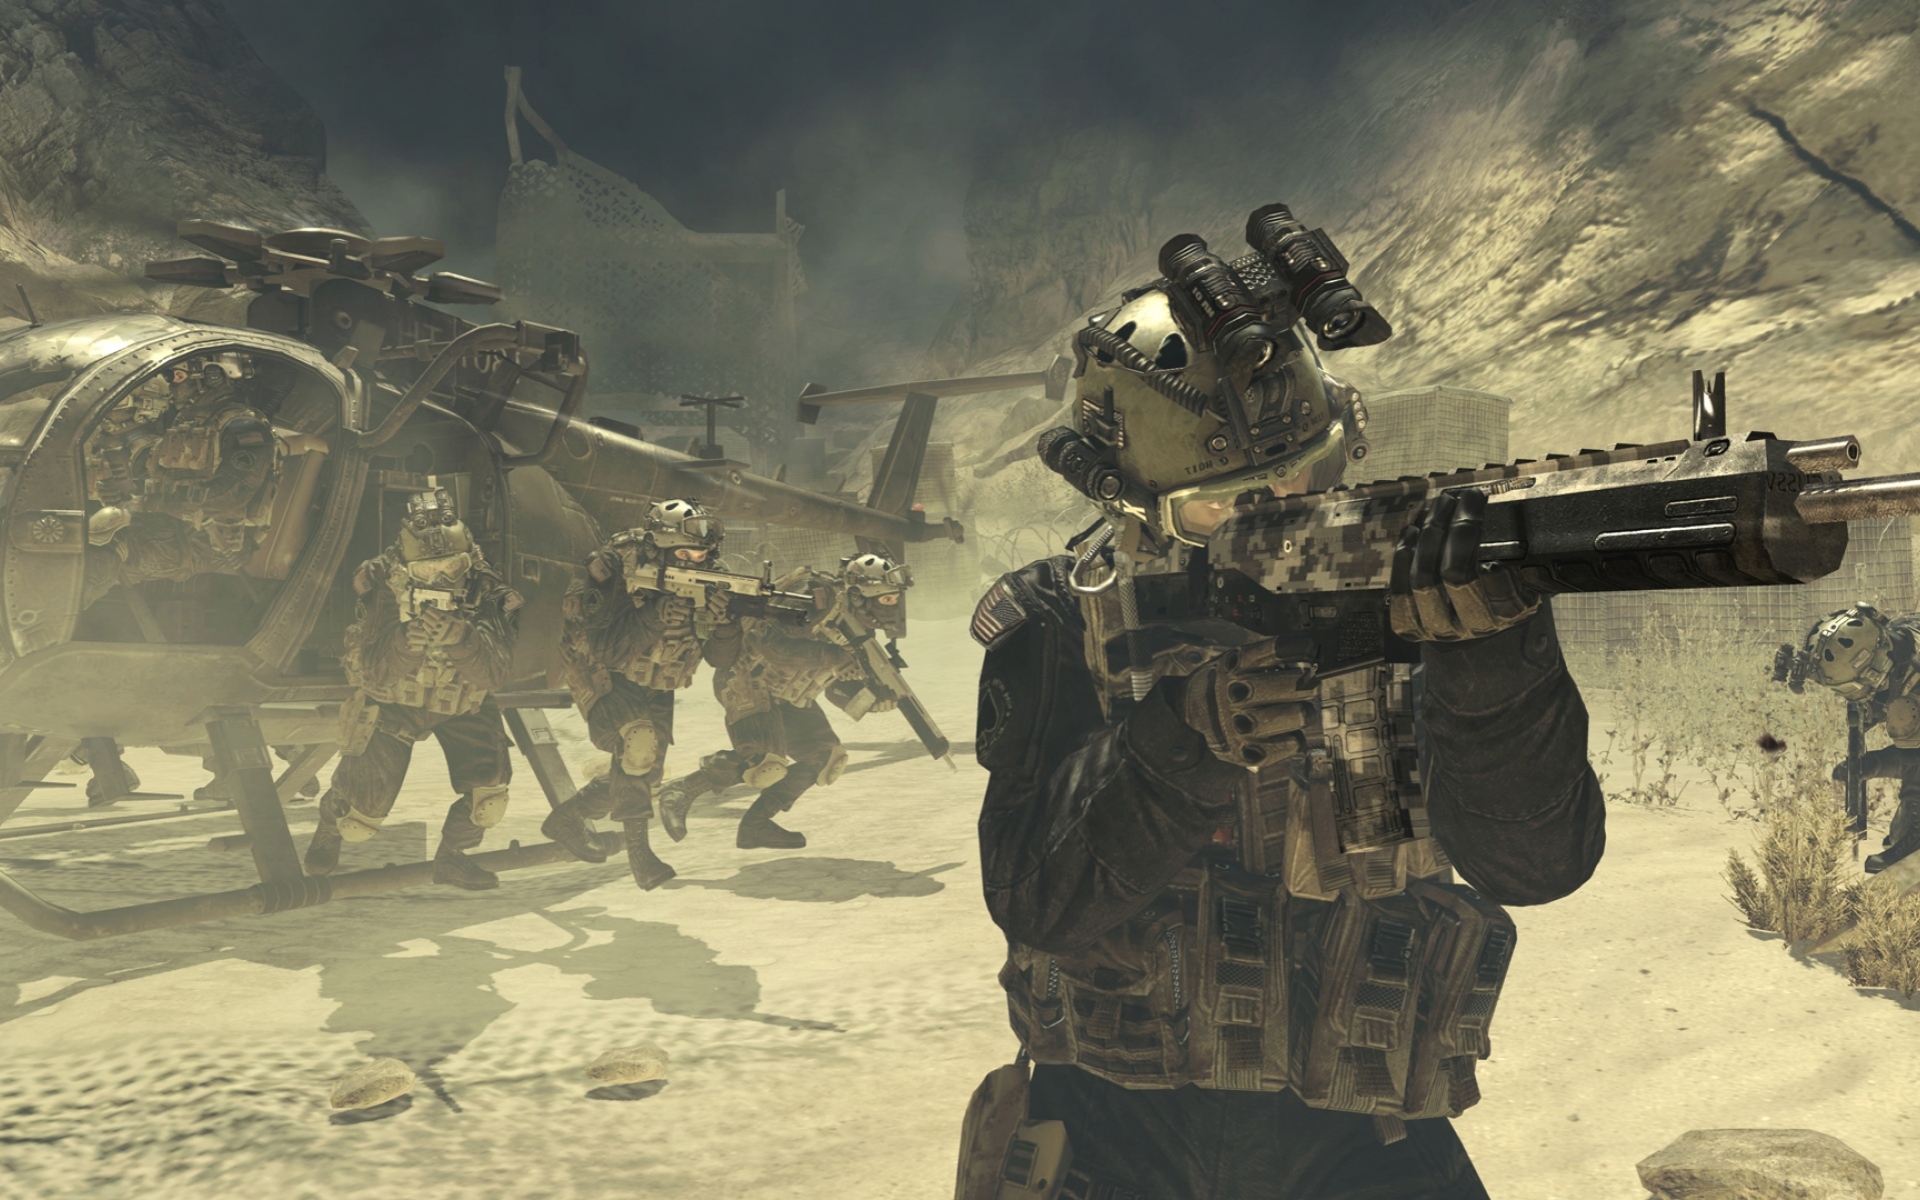 call of duty modern warfare 2 персонажи картинки